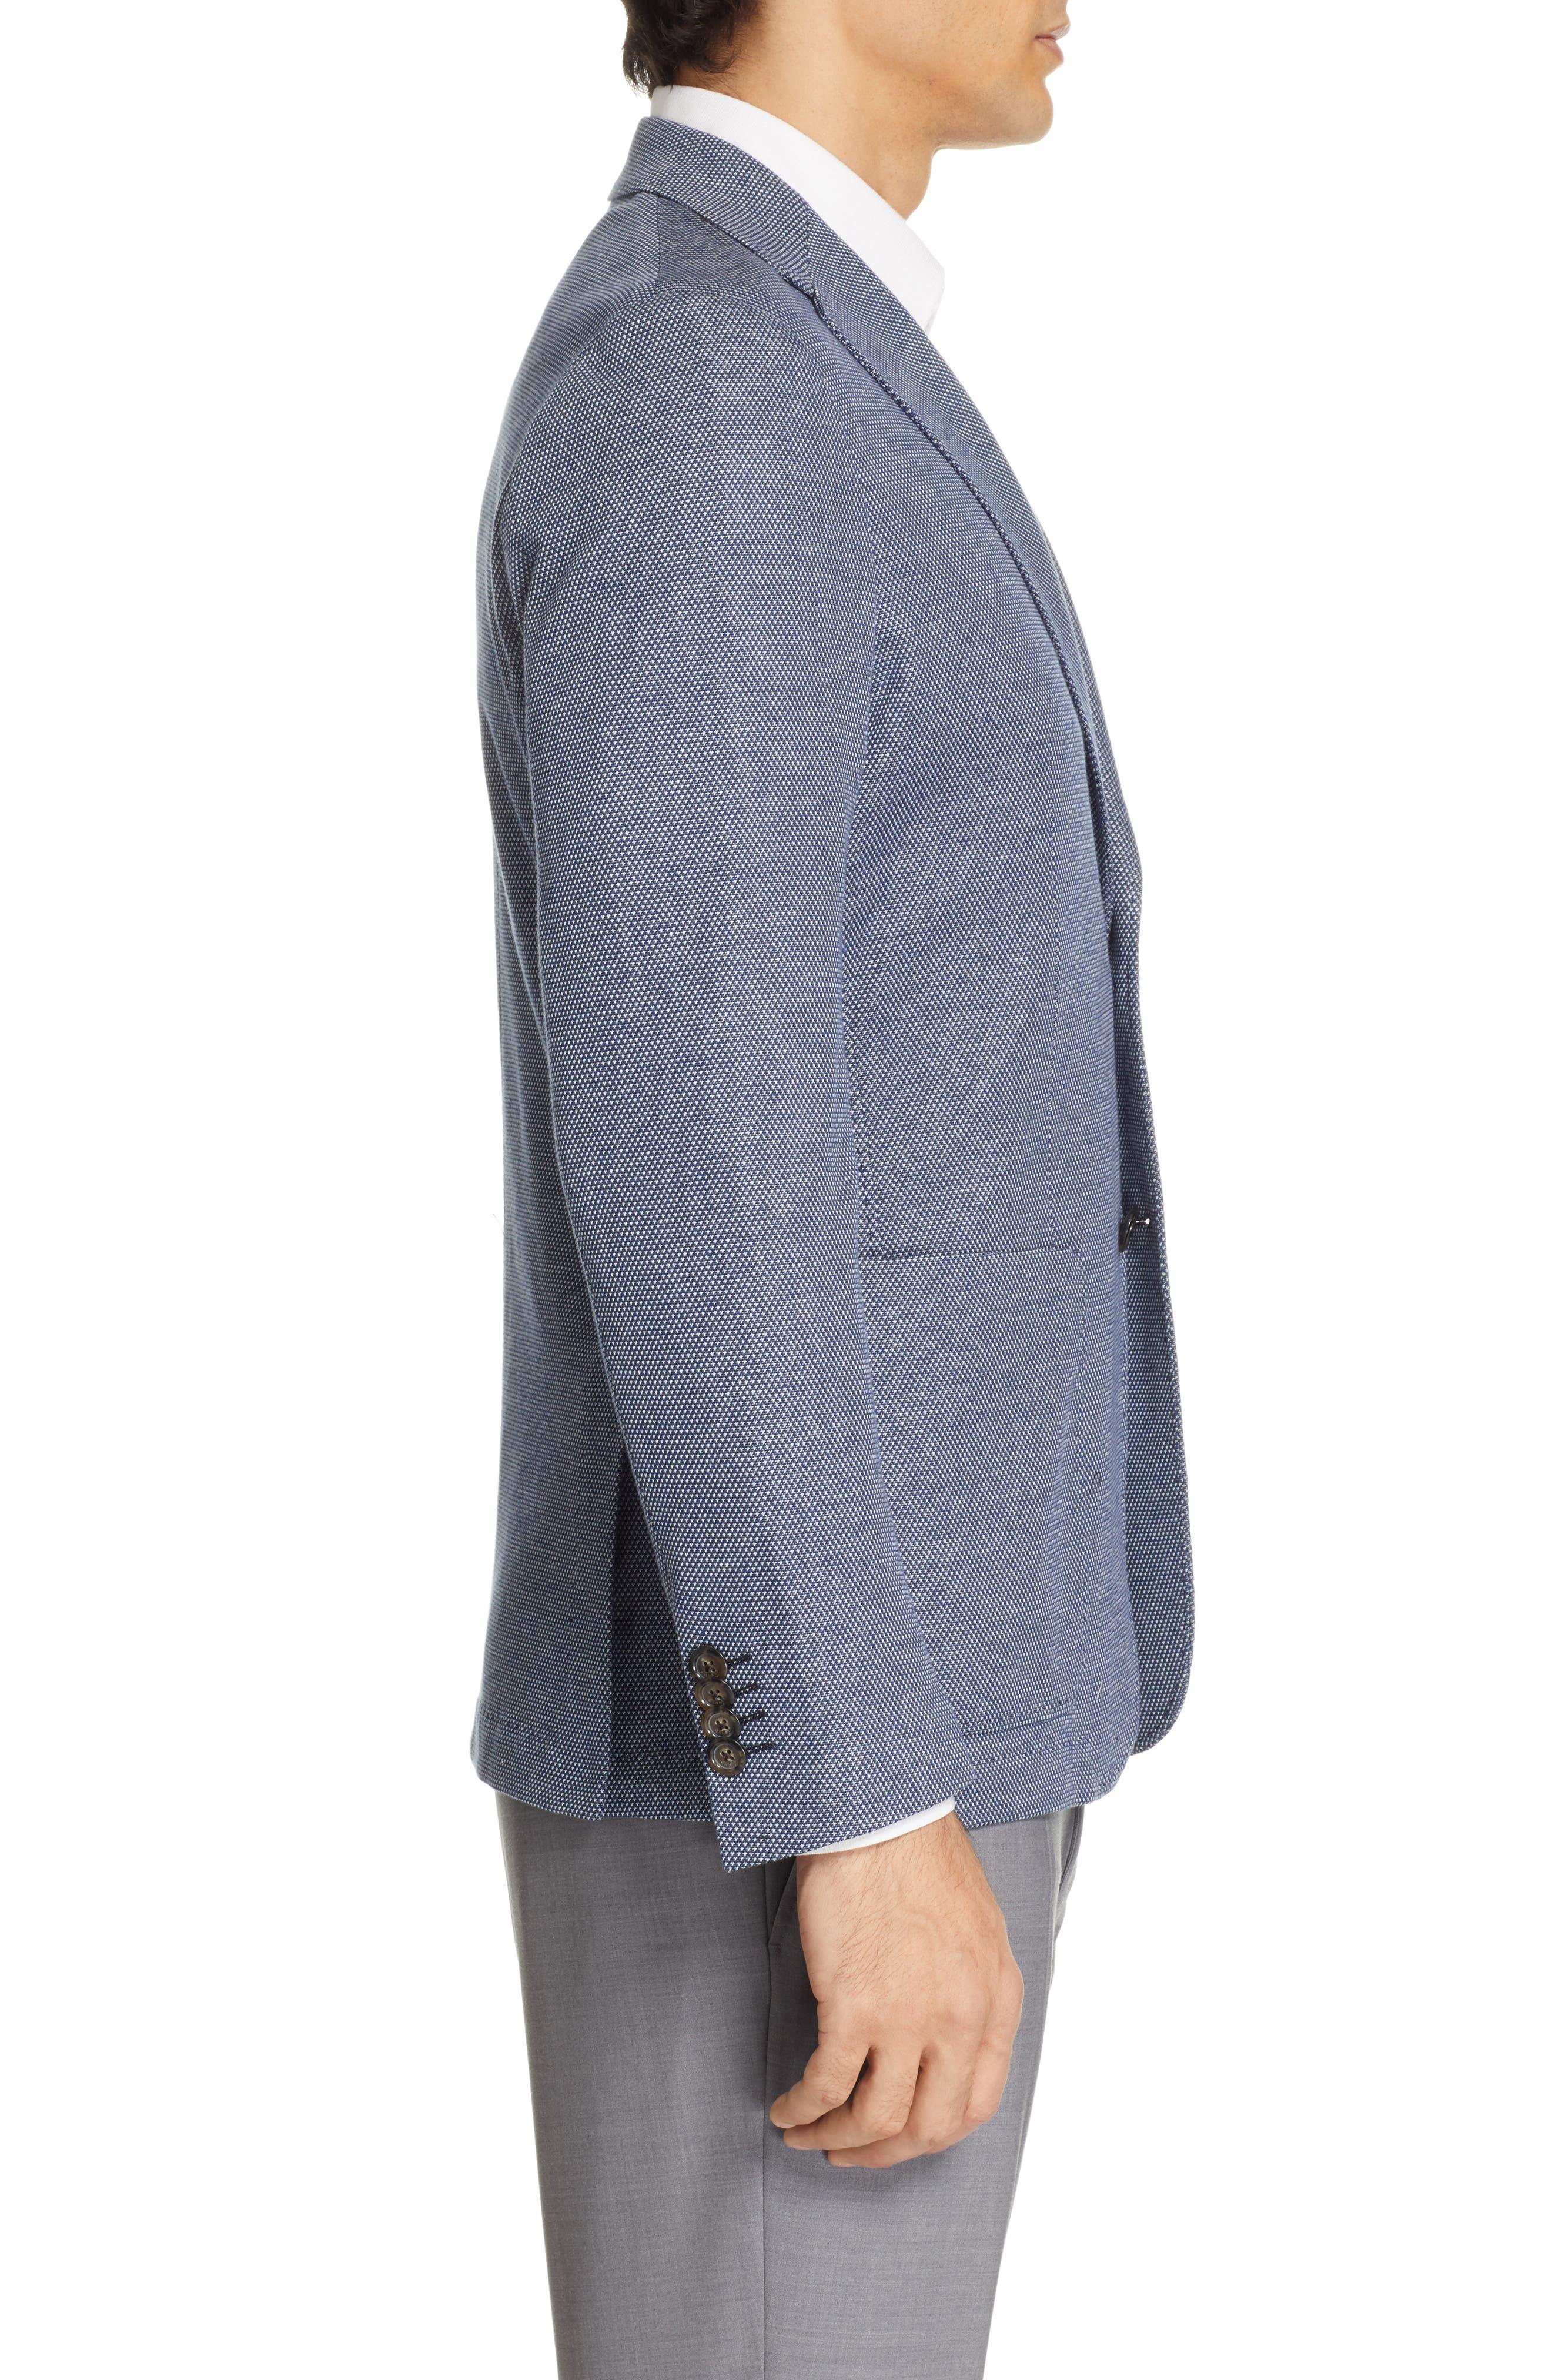 CANALI, Classic Fit Cotton Blend Sport Coat, Alternate thumbnail 3, color, NAVY